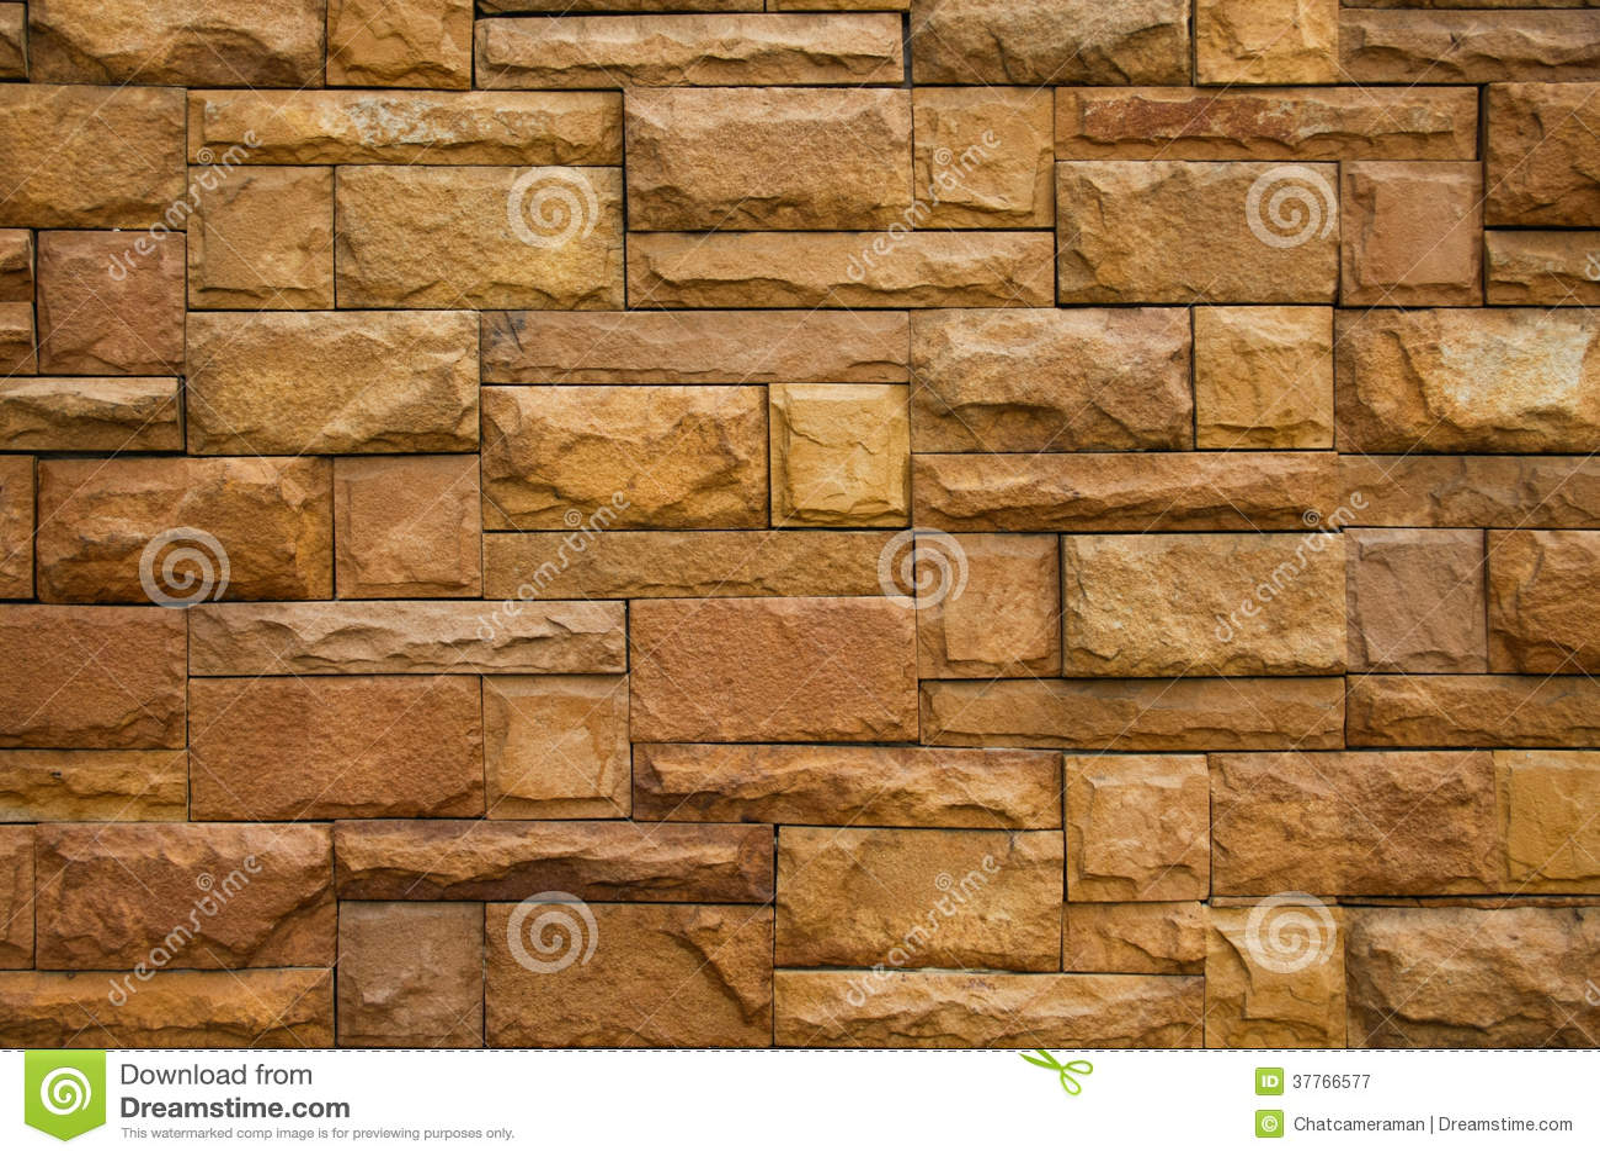 Piedra para pared exterior para productos de piedra - Piedra pared exterior ...